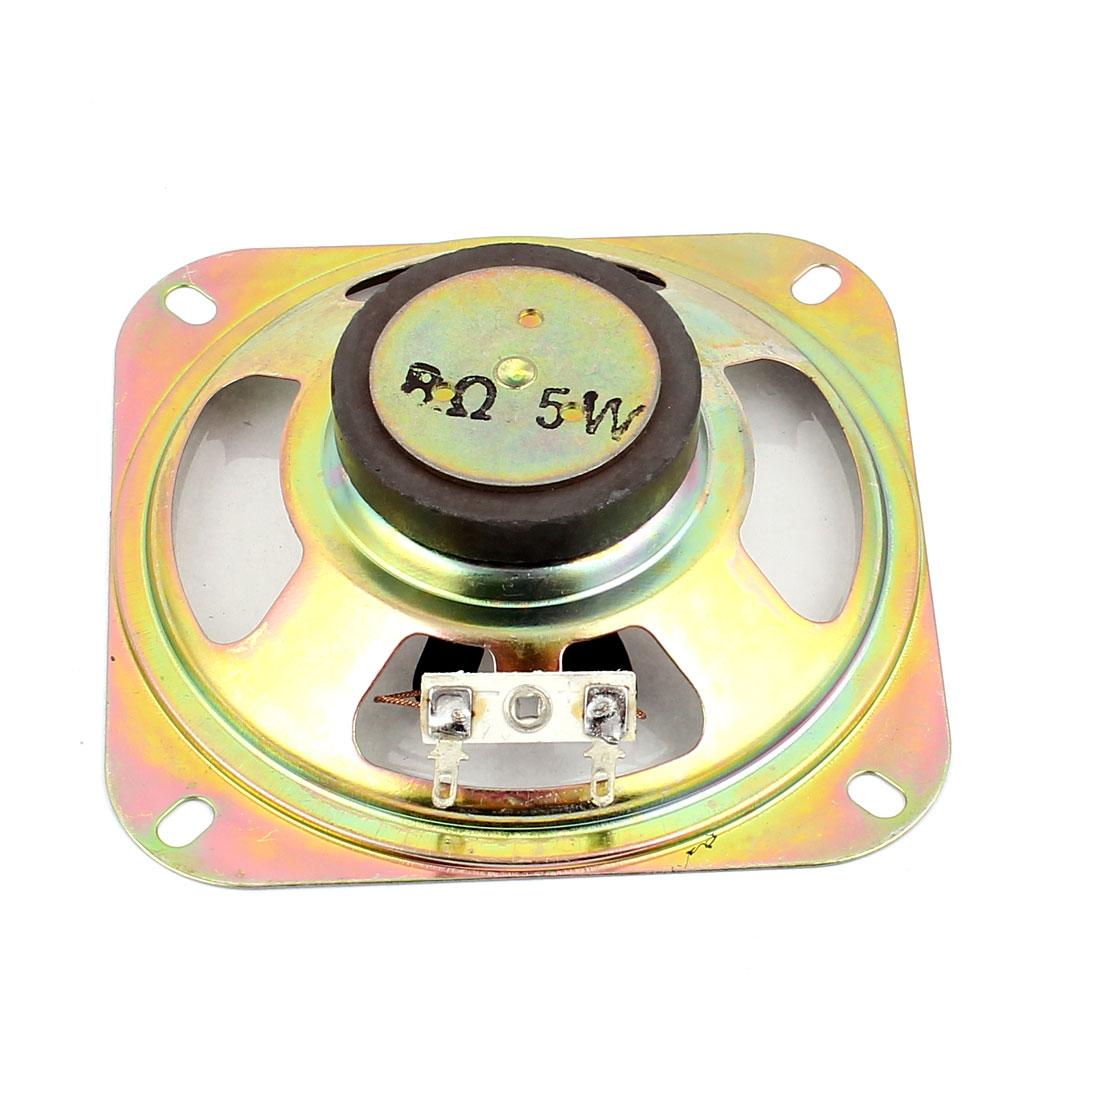 5W 8 Ohm External Magnet Speaker Loudspeaker 10 x 10 x 3cm